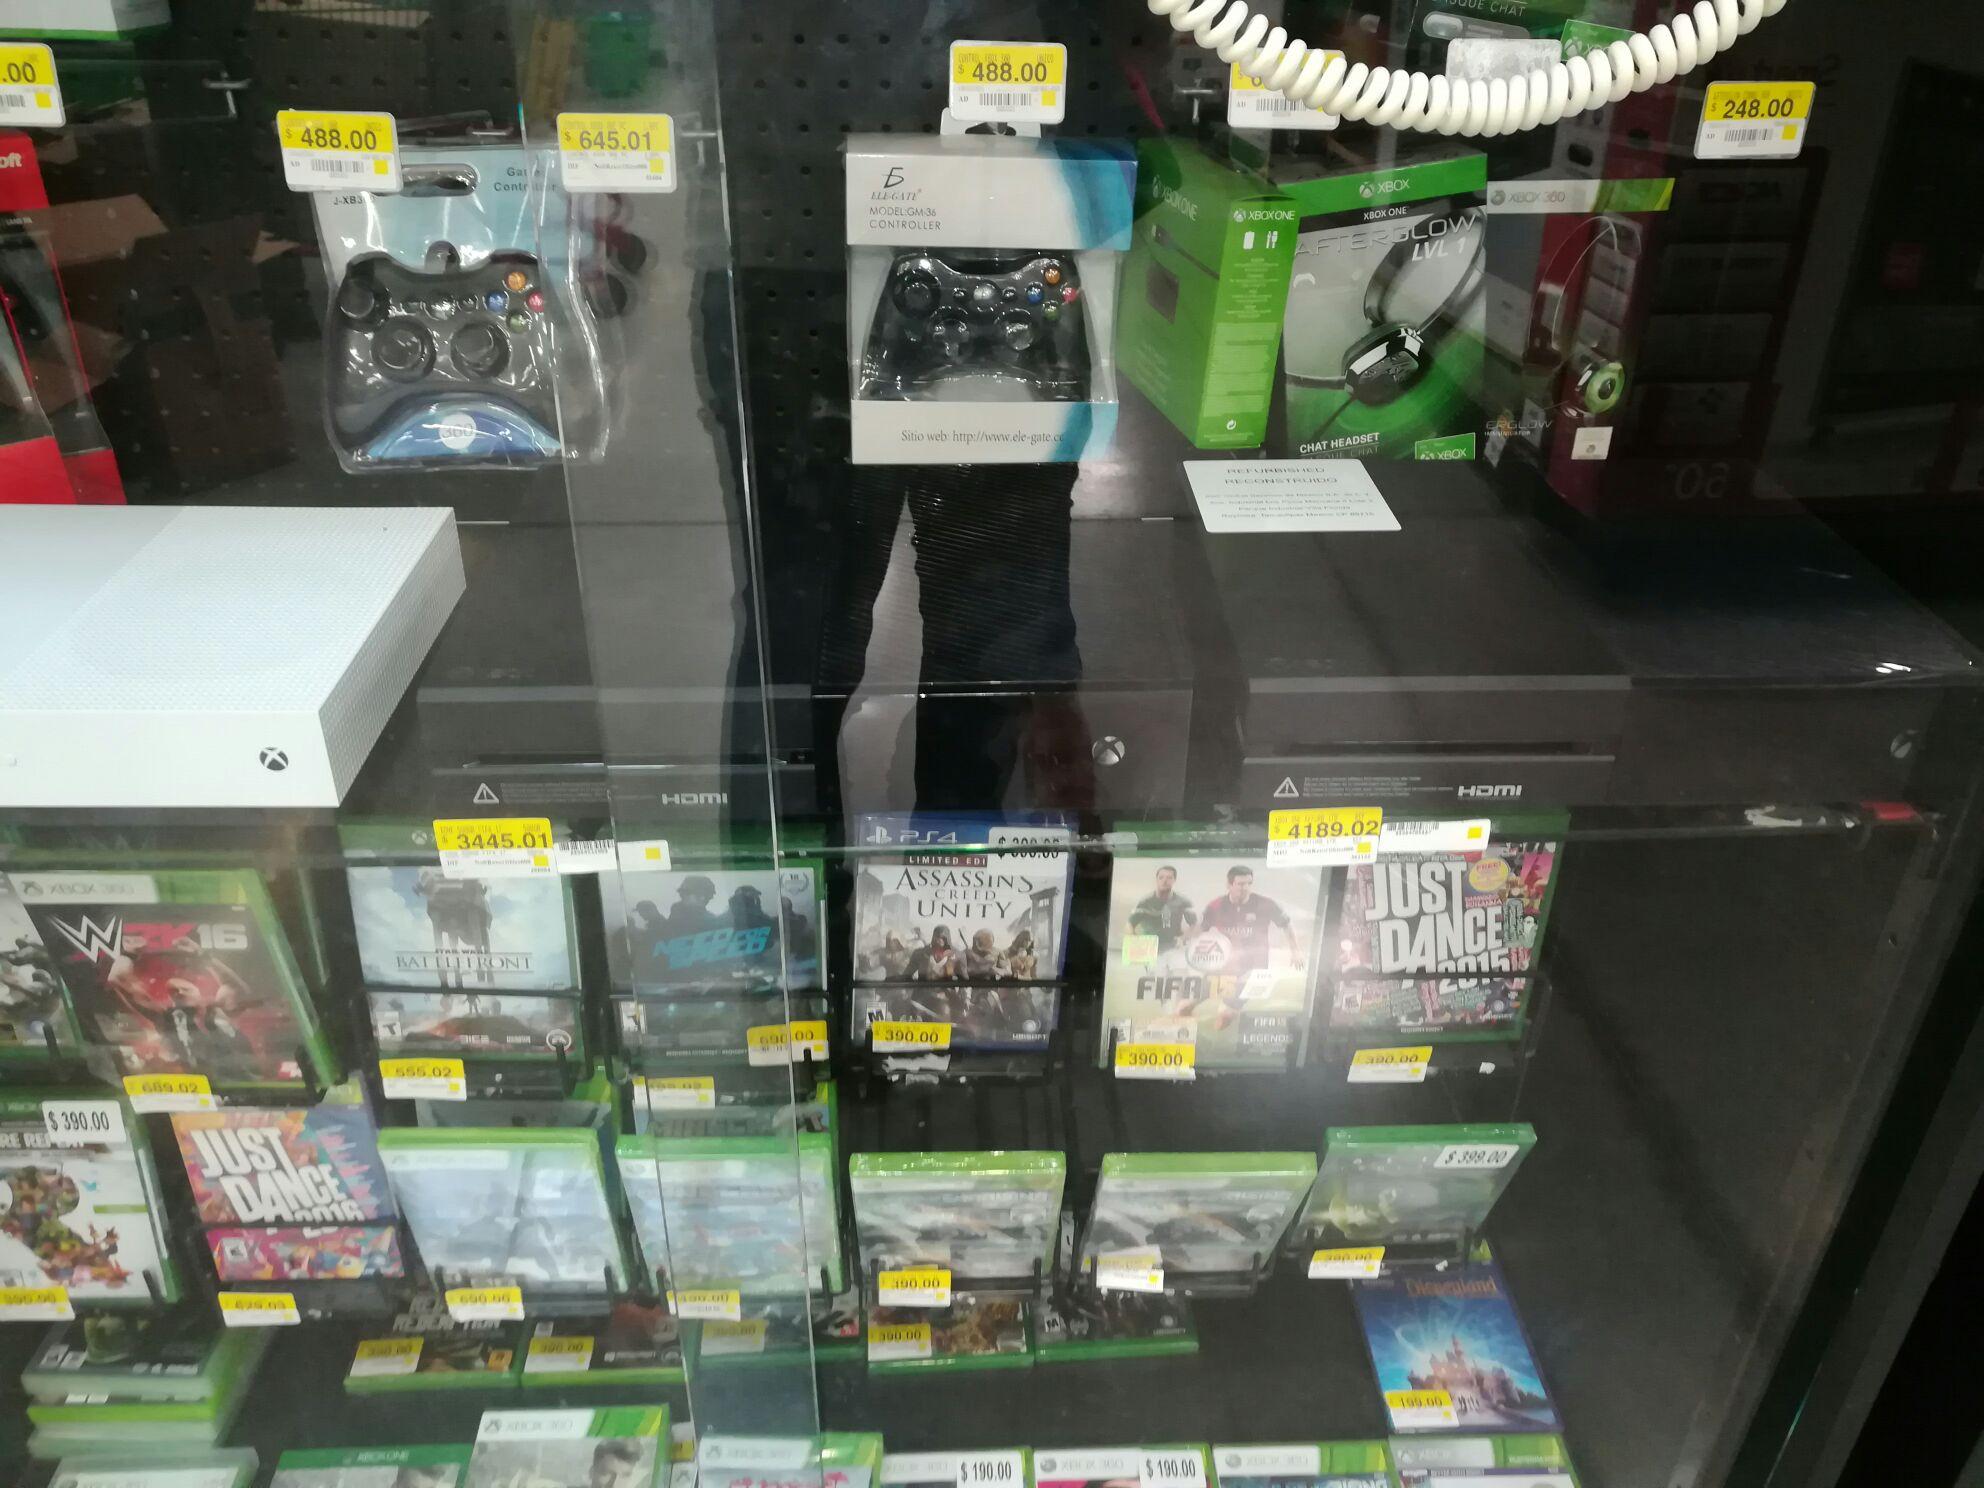 consolas de videojuegos en bodega aurrera